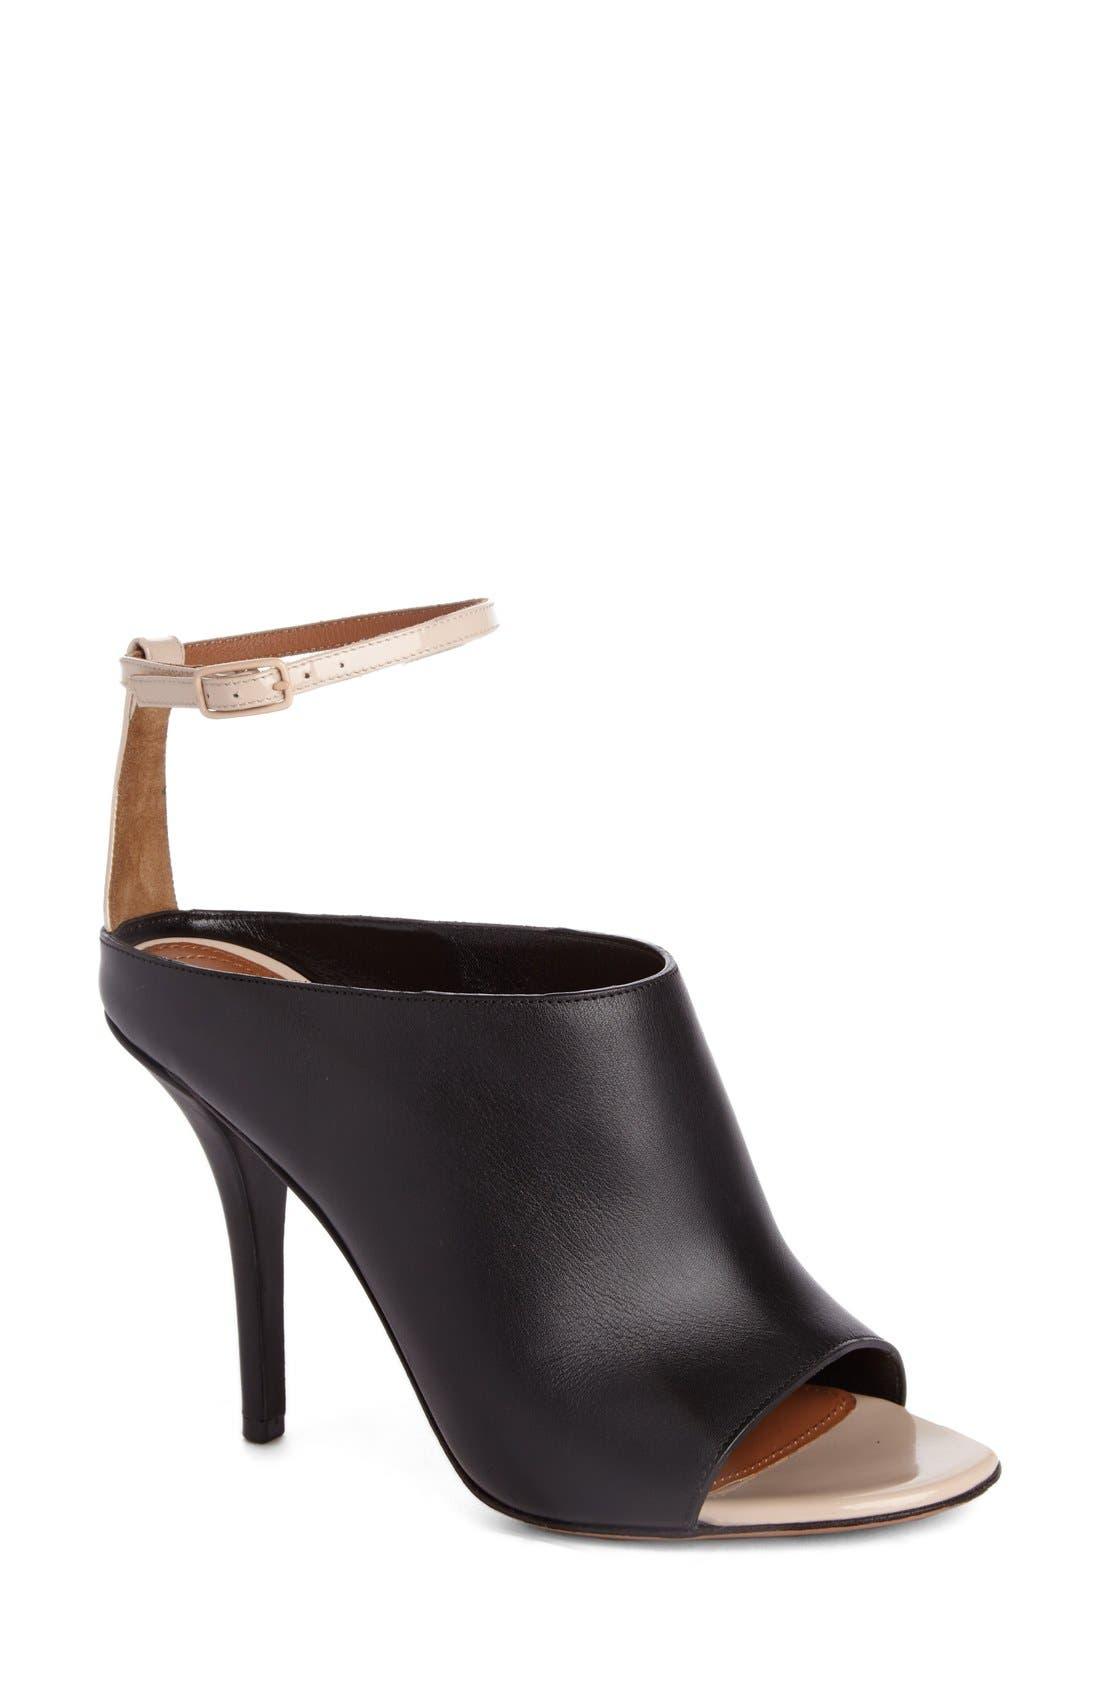 Main Image - Givenchy Ankle Strap Sandal (Women)